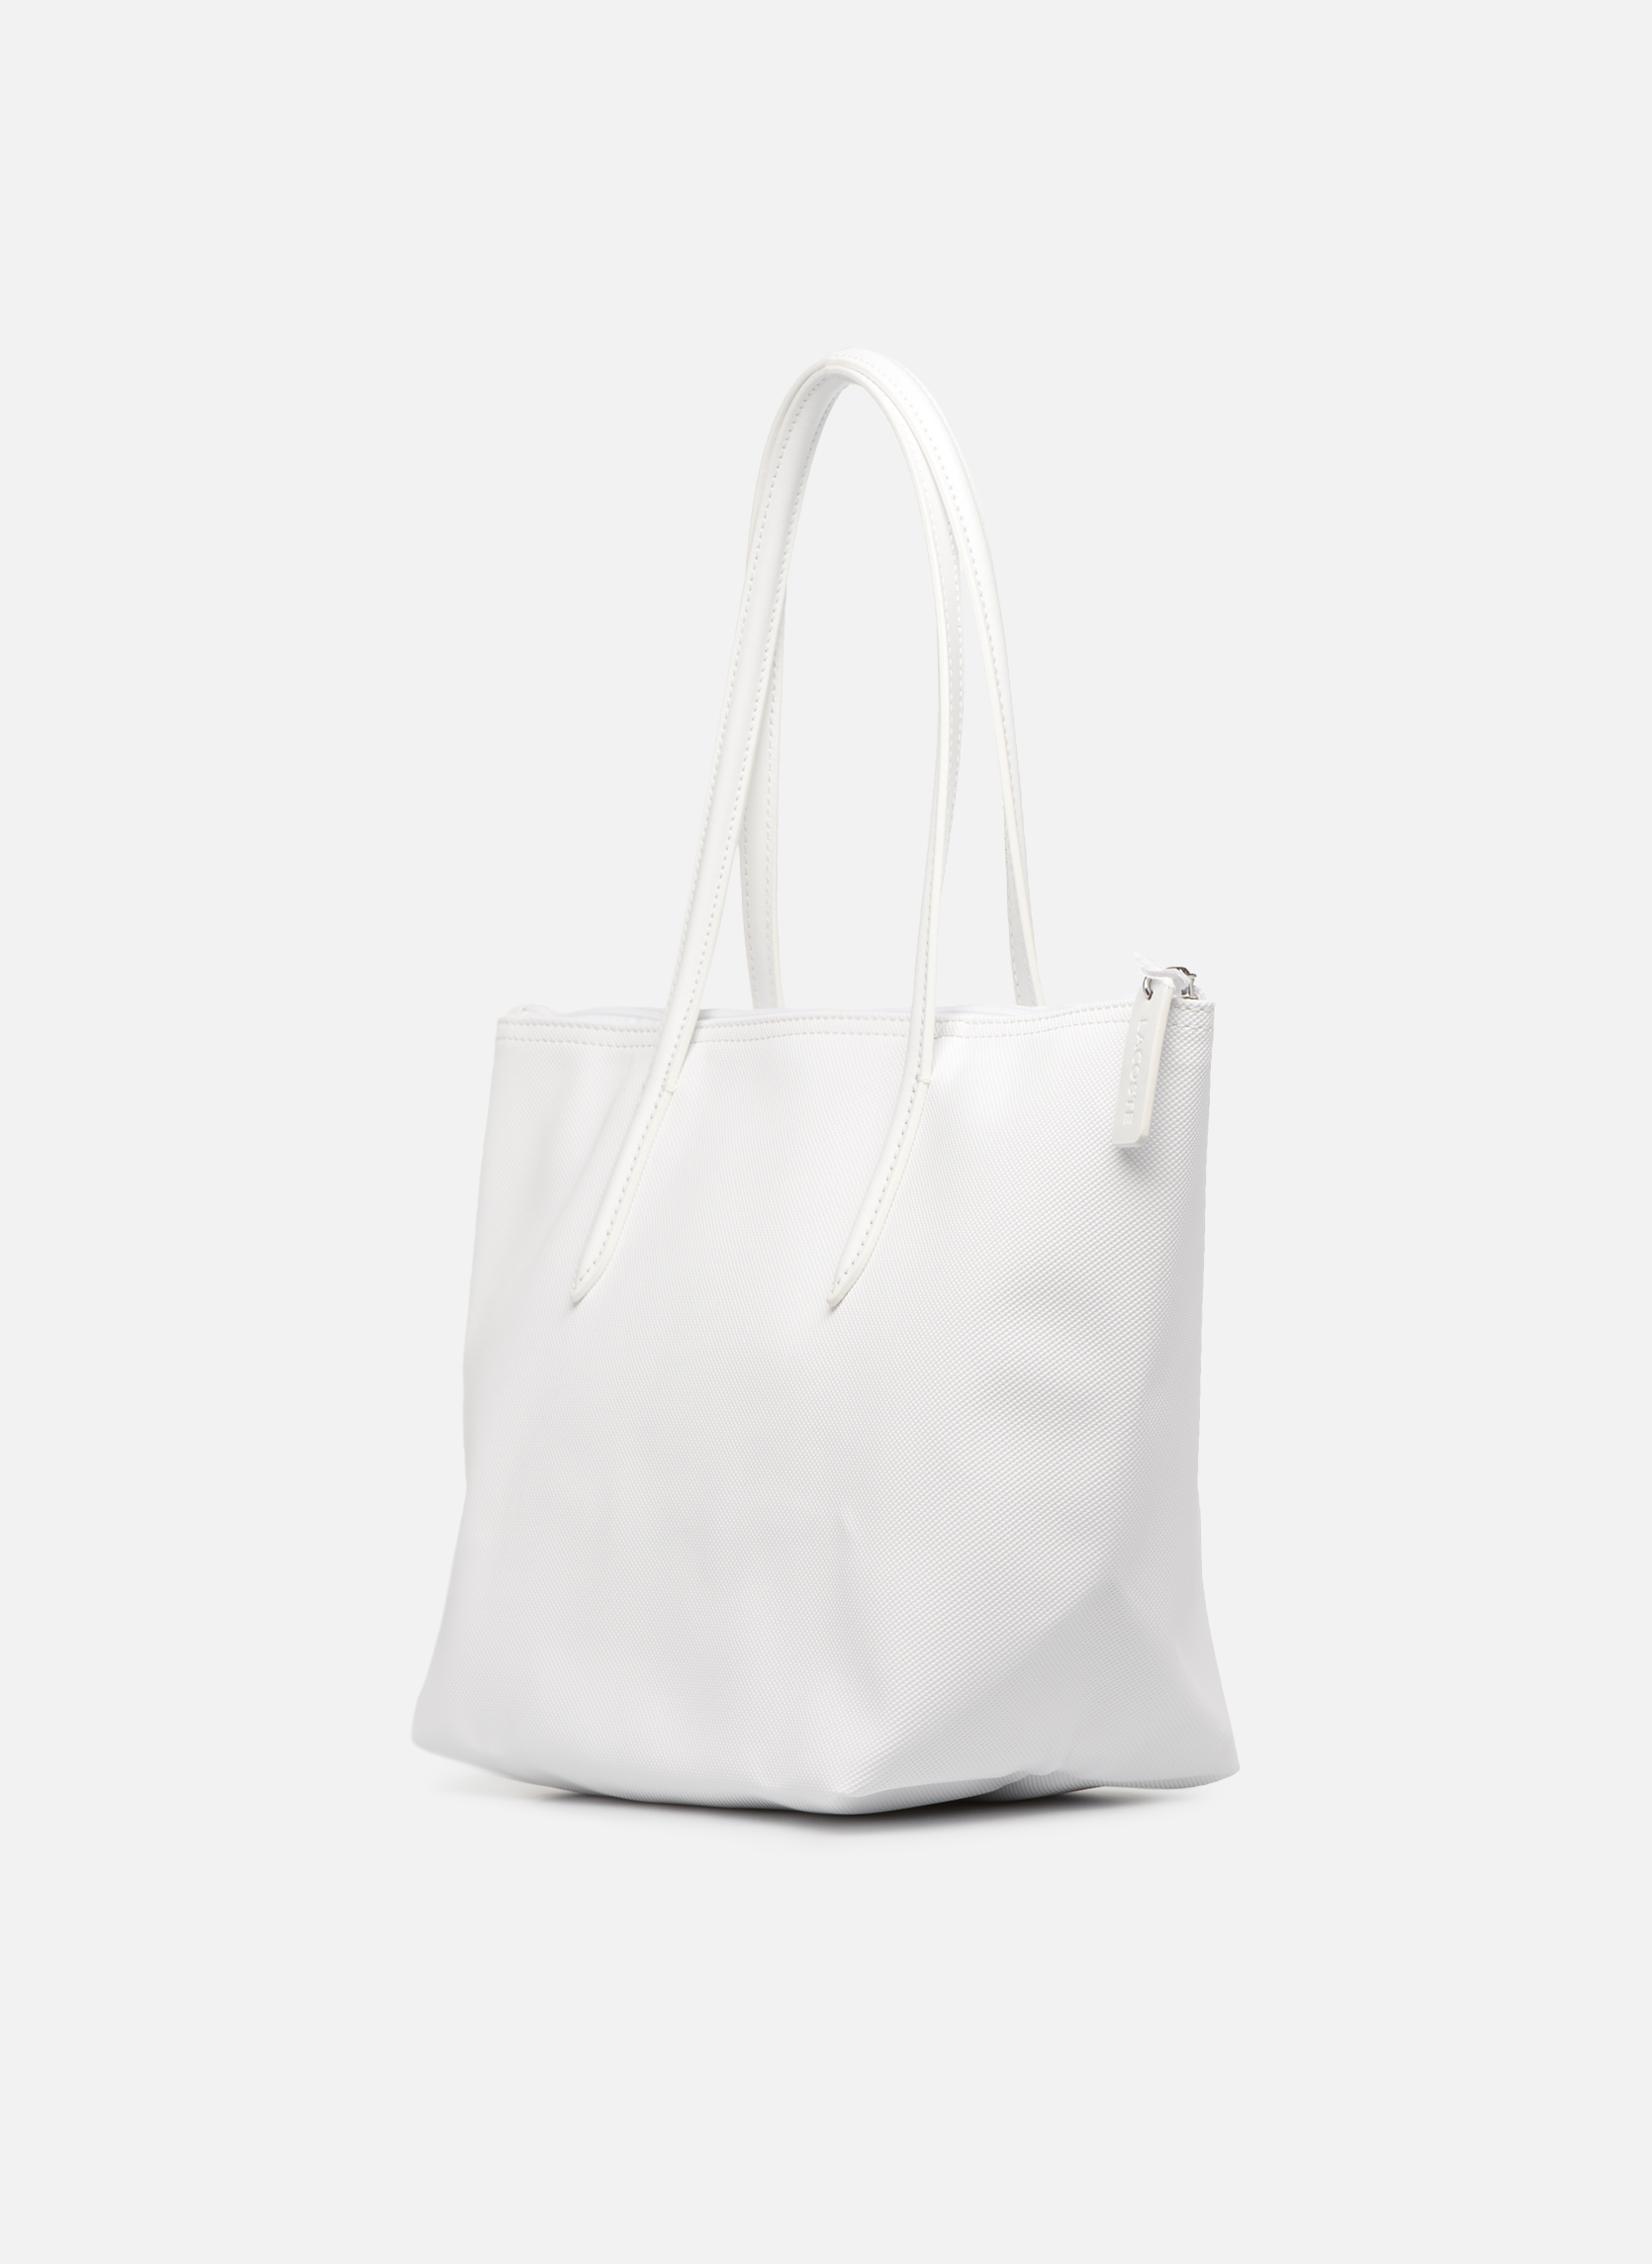 S SHOPPING BAG Bright white